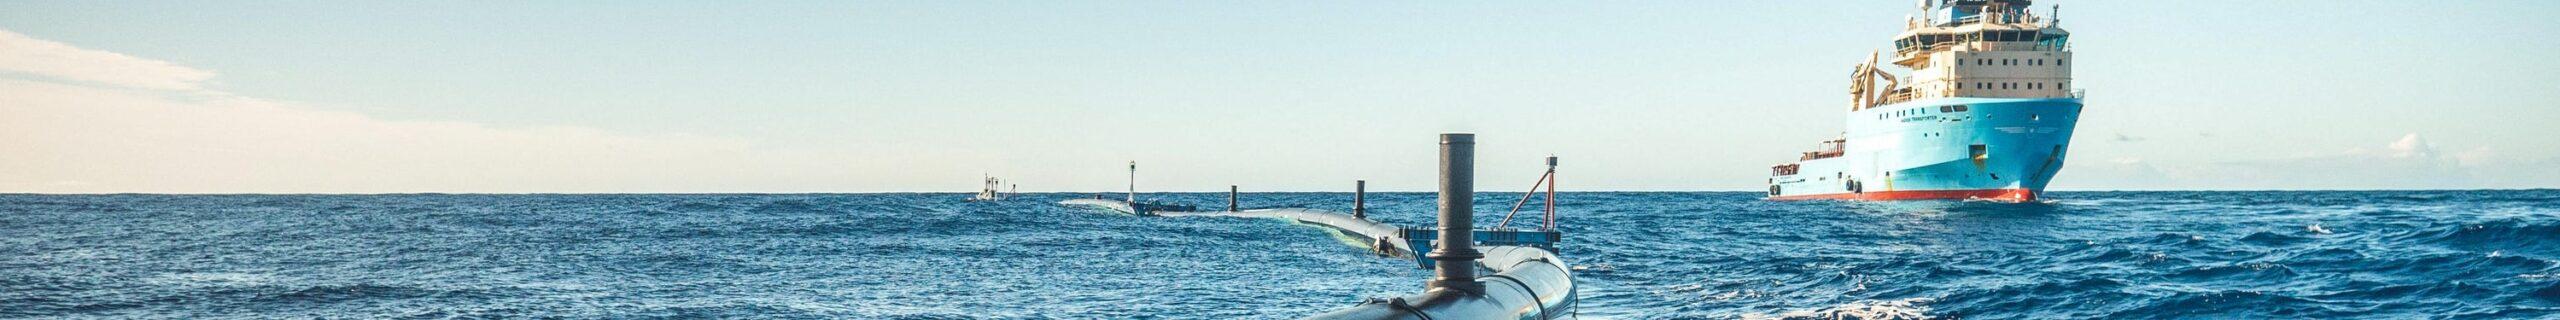 Sci-Friday #124 - Ocean Cleanup - Solarpunk IRL